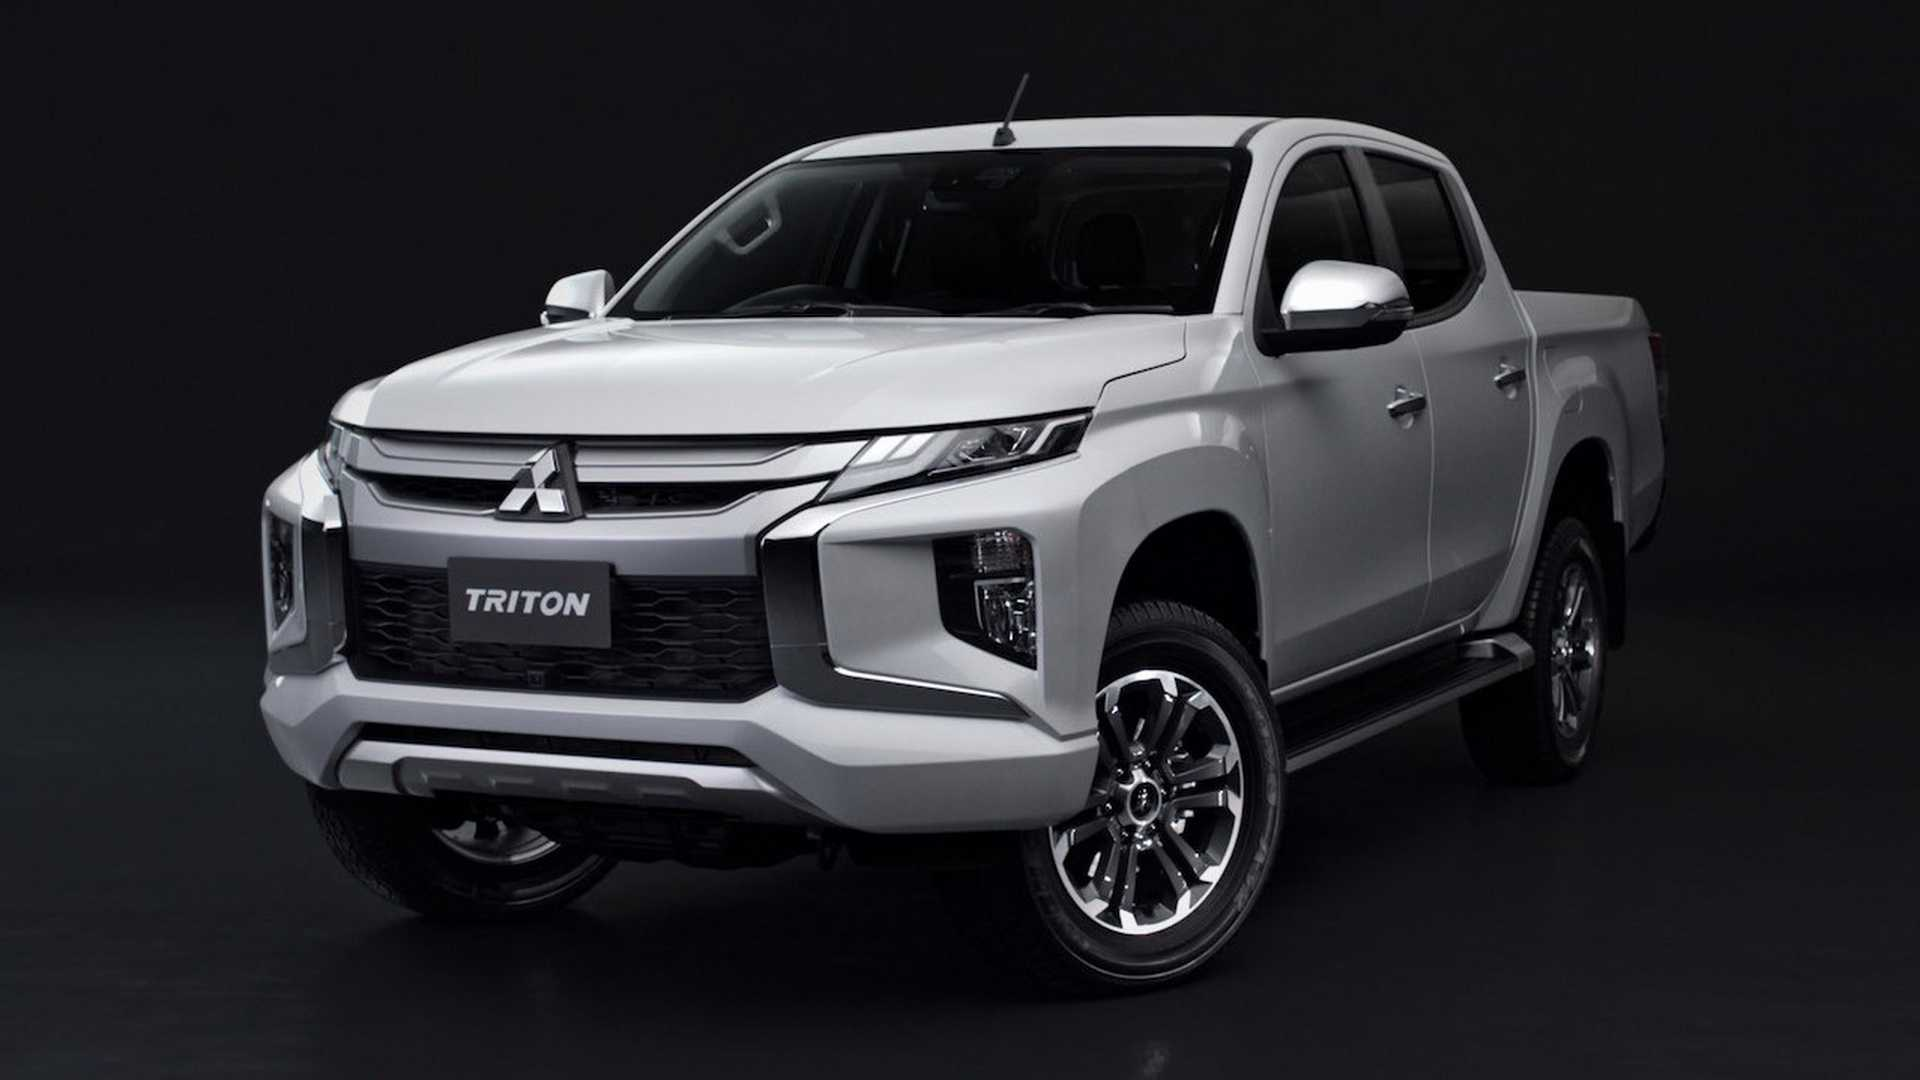 2019 Mitsubishi L200 / Triton Goes Official With Bold Design